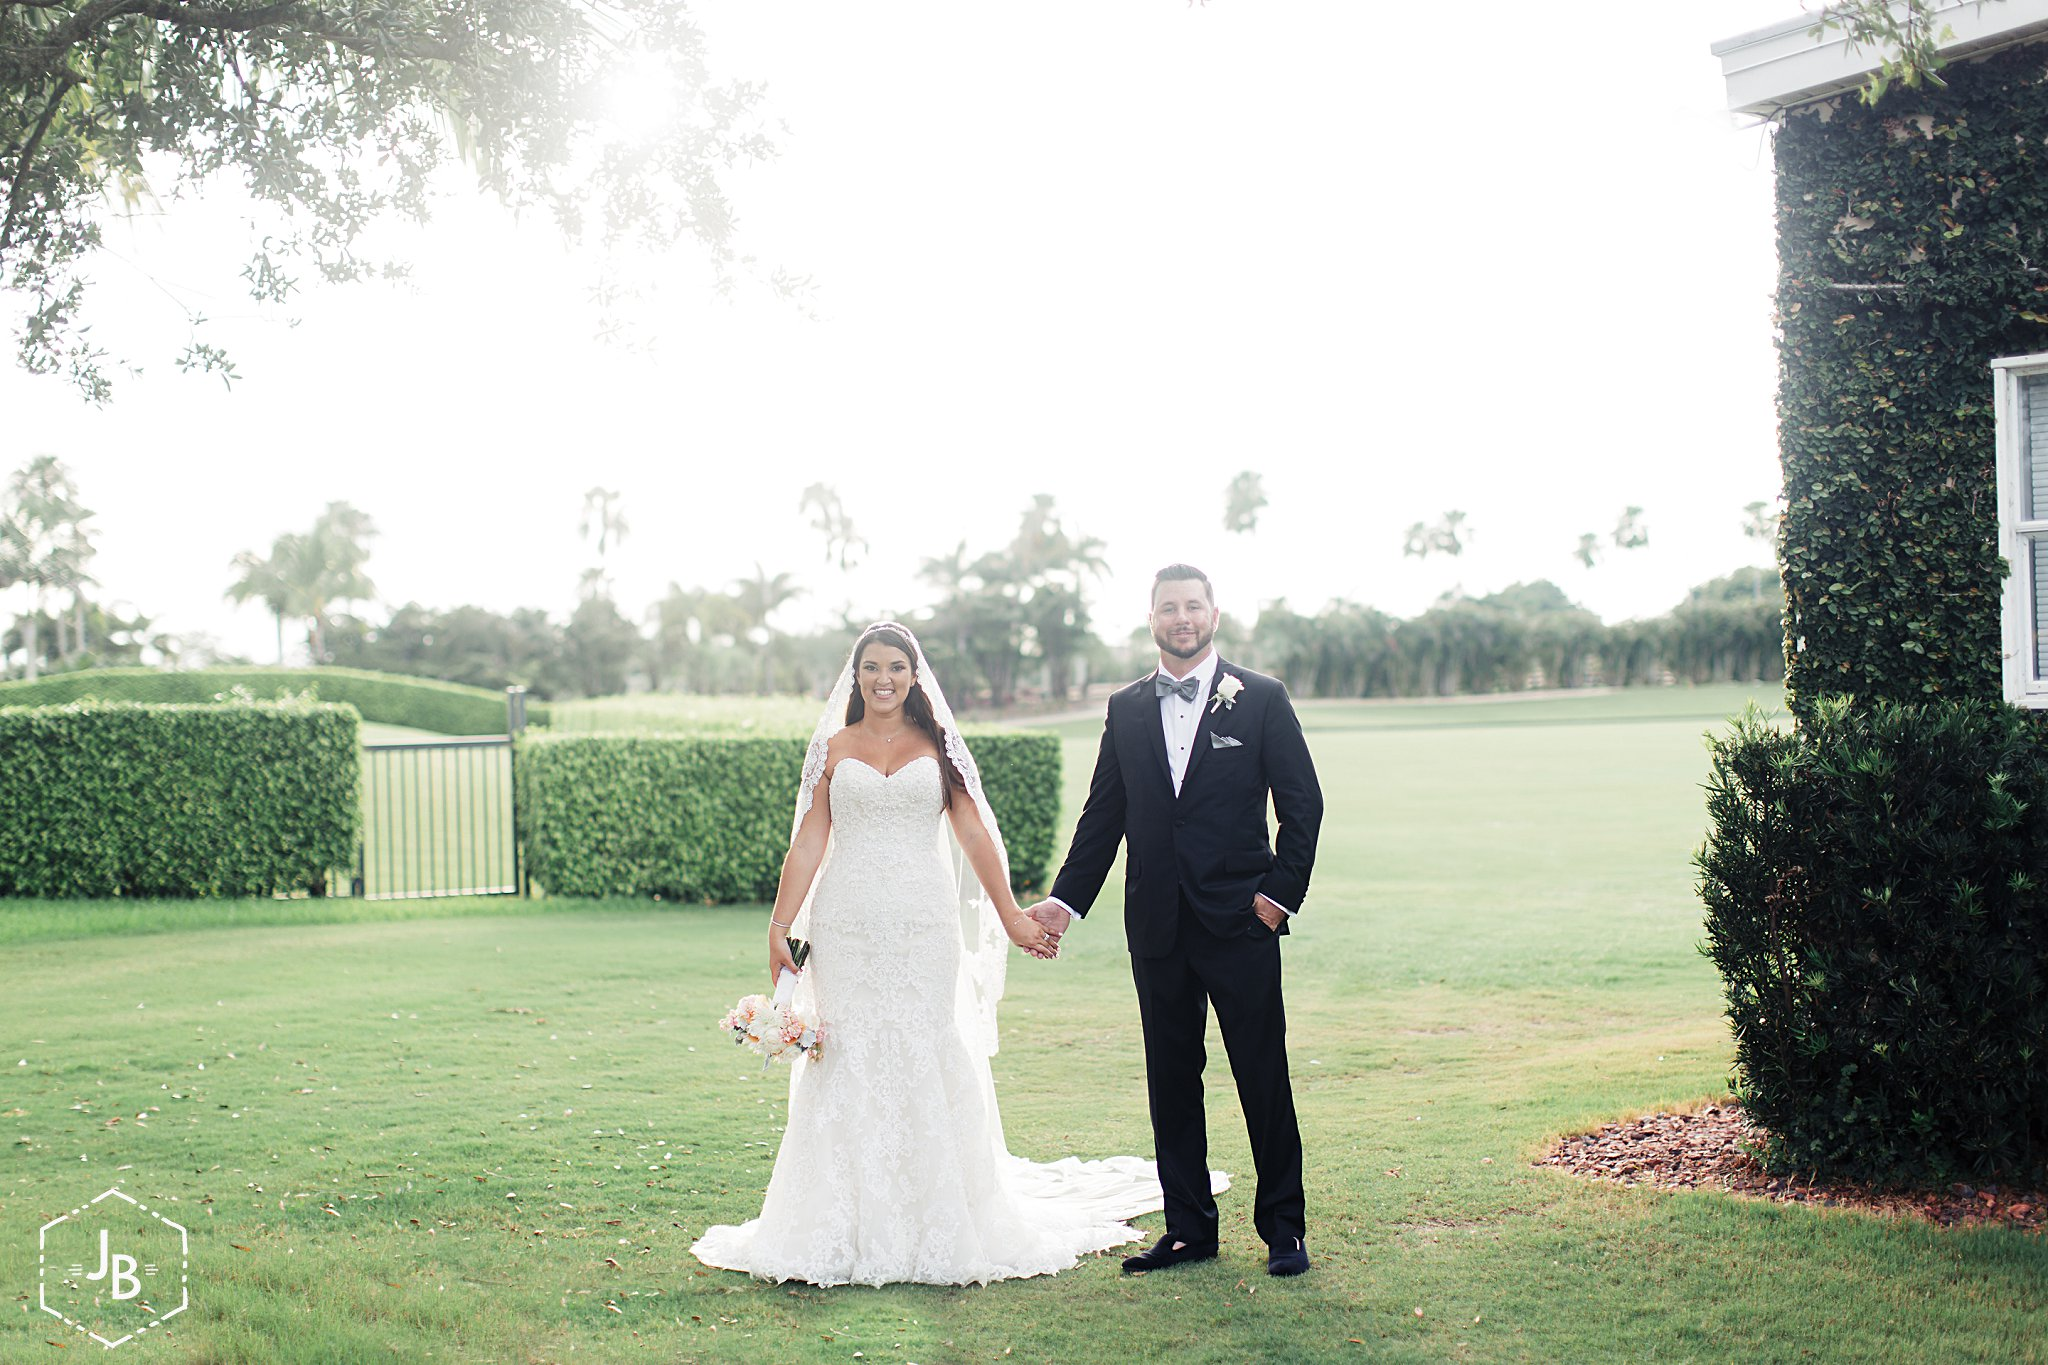 WeddingandEngagementFloridaPhotographer_2809.jpg